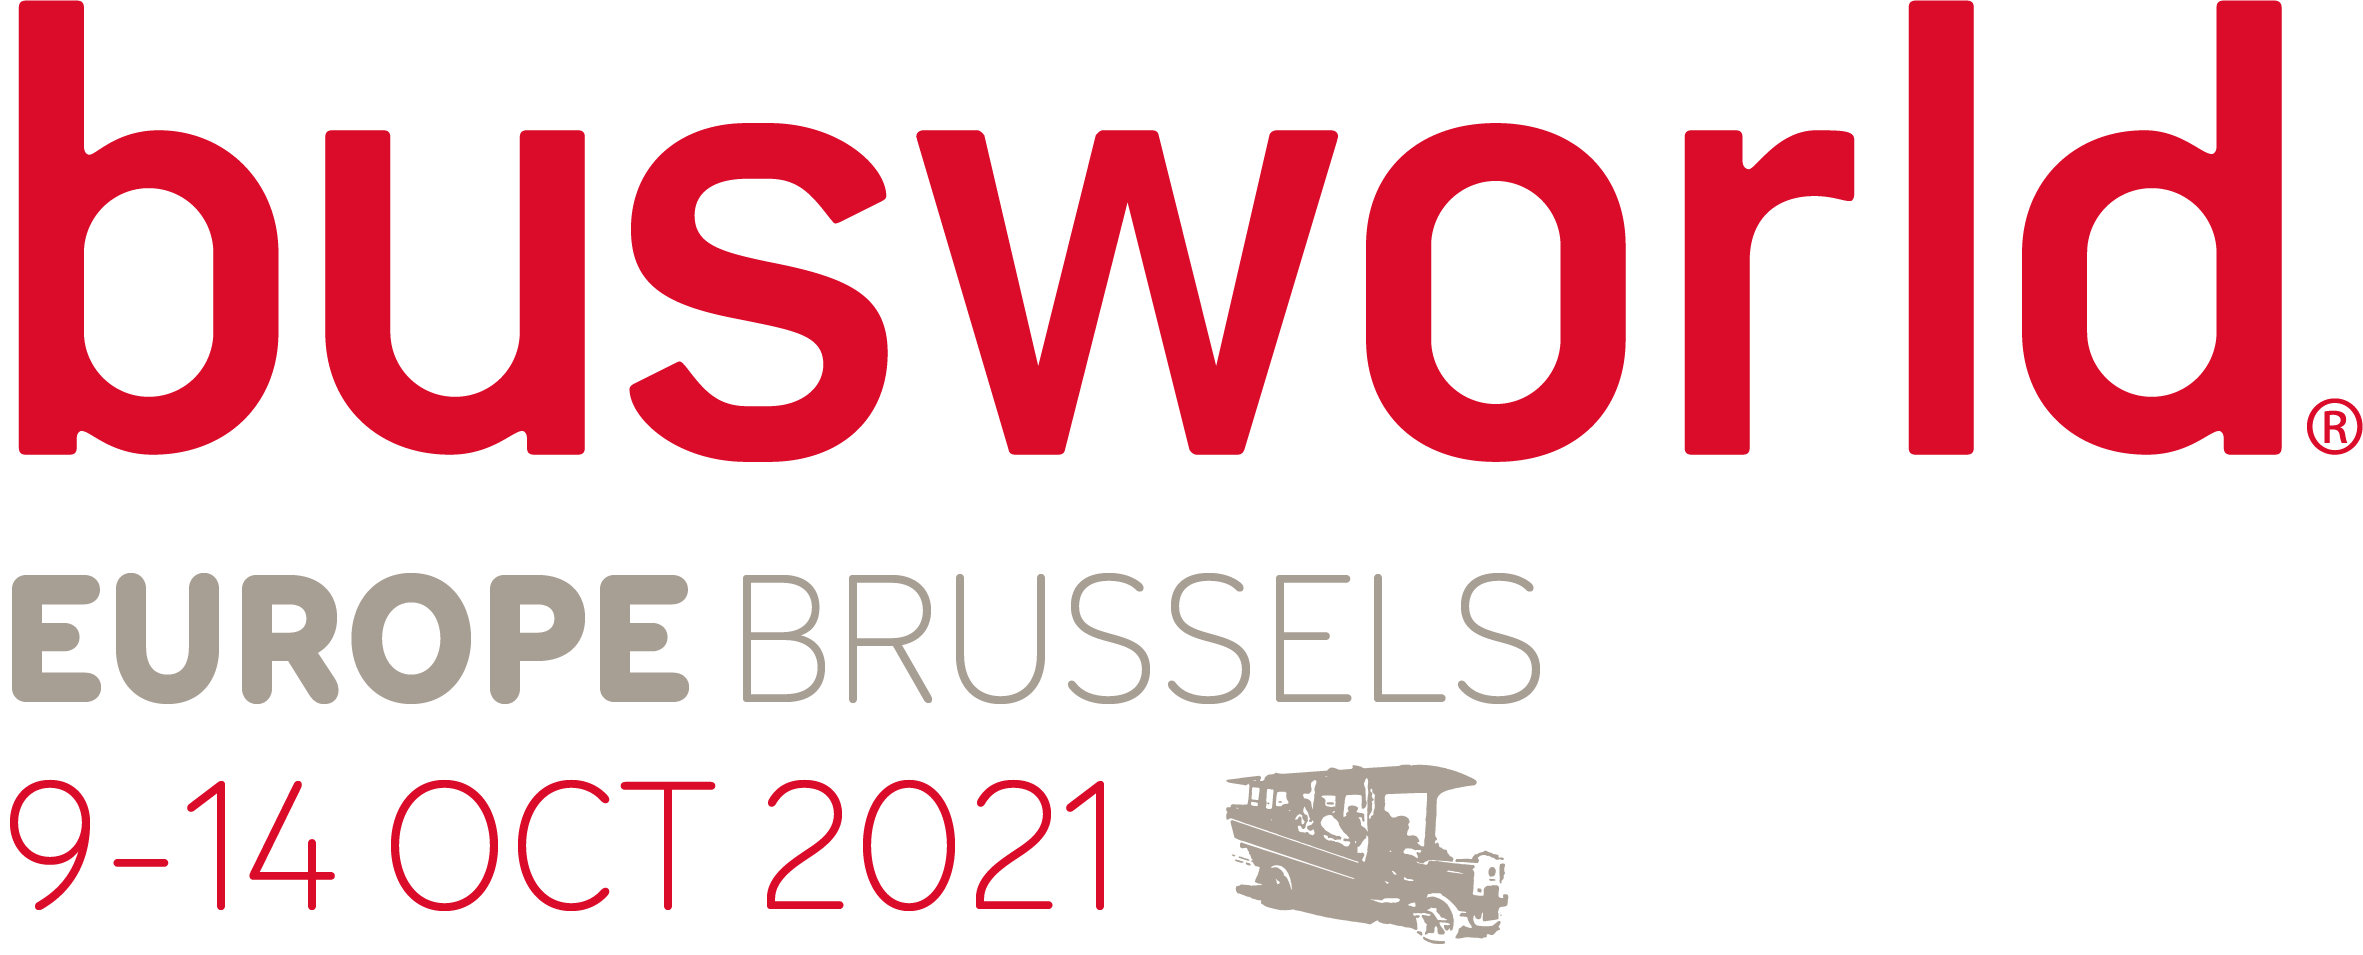 busworld europe 2021